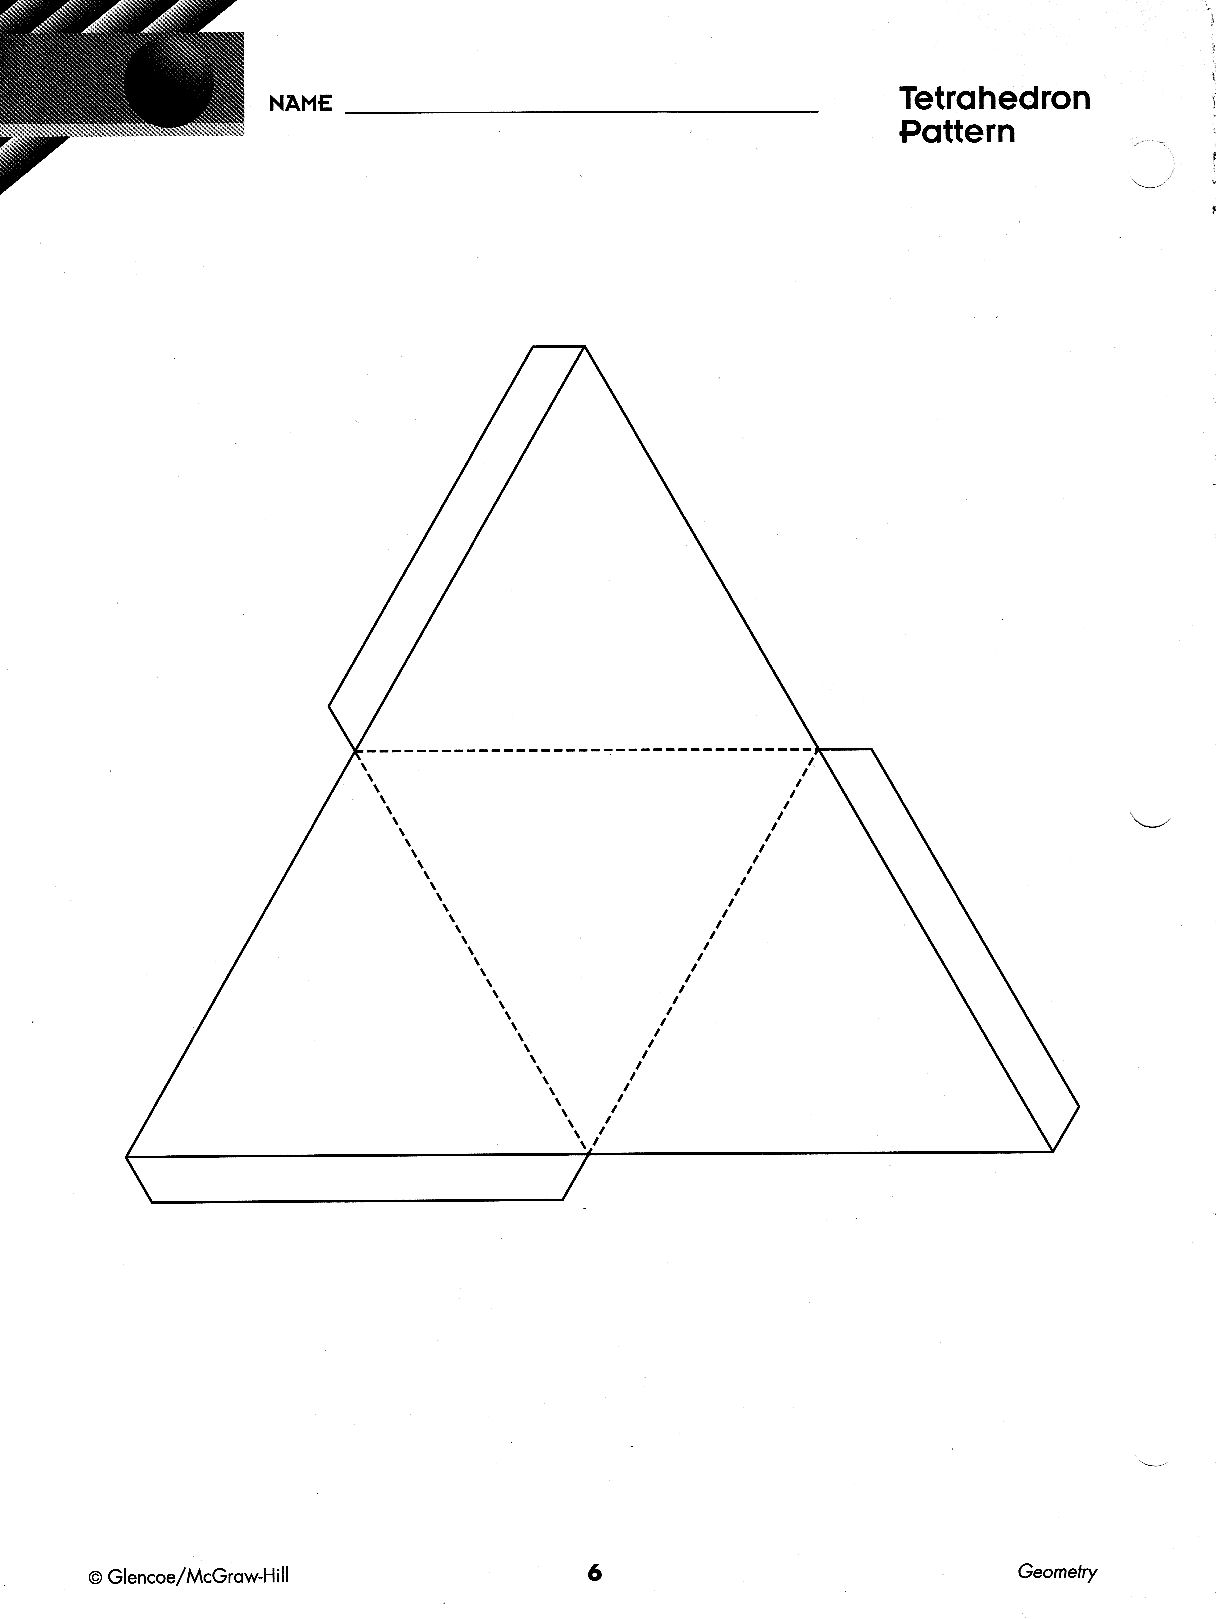 83+ Tetrahedron Pattern - Stellated Octahedron Stellation Platonic ...